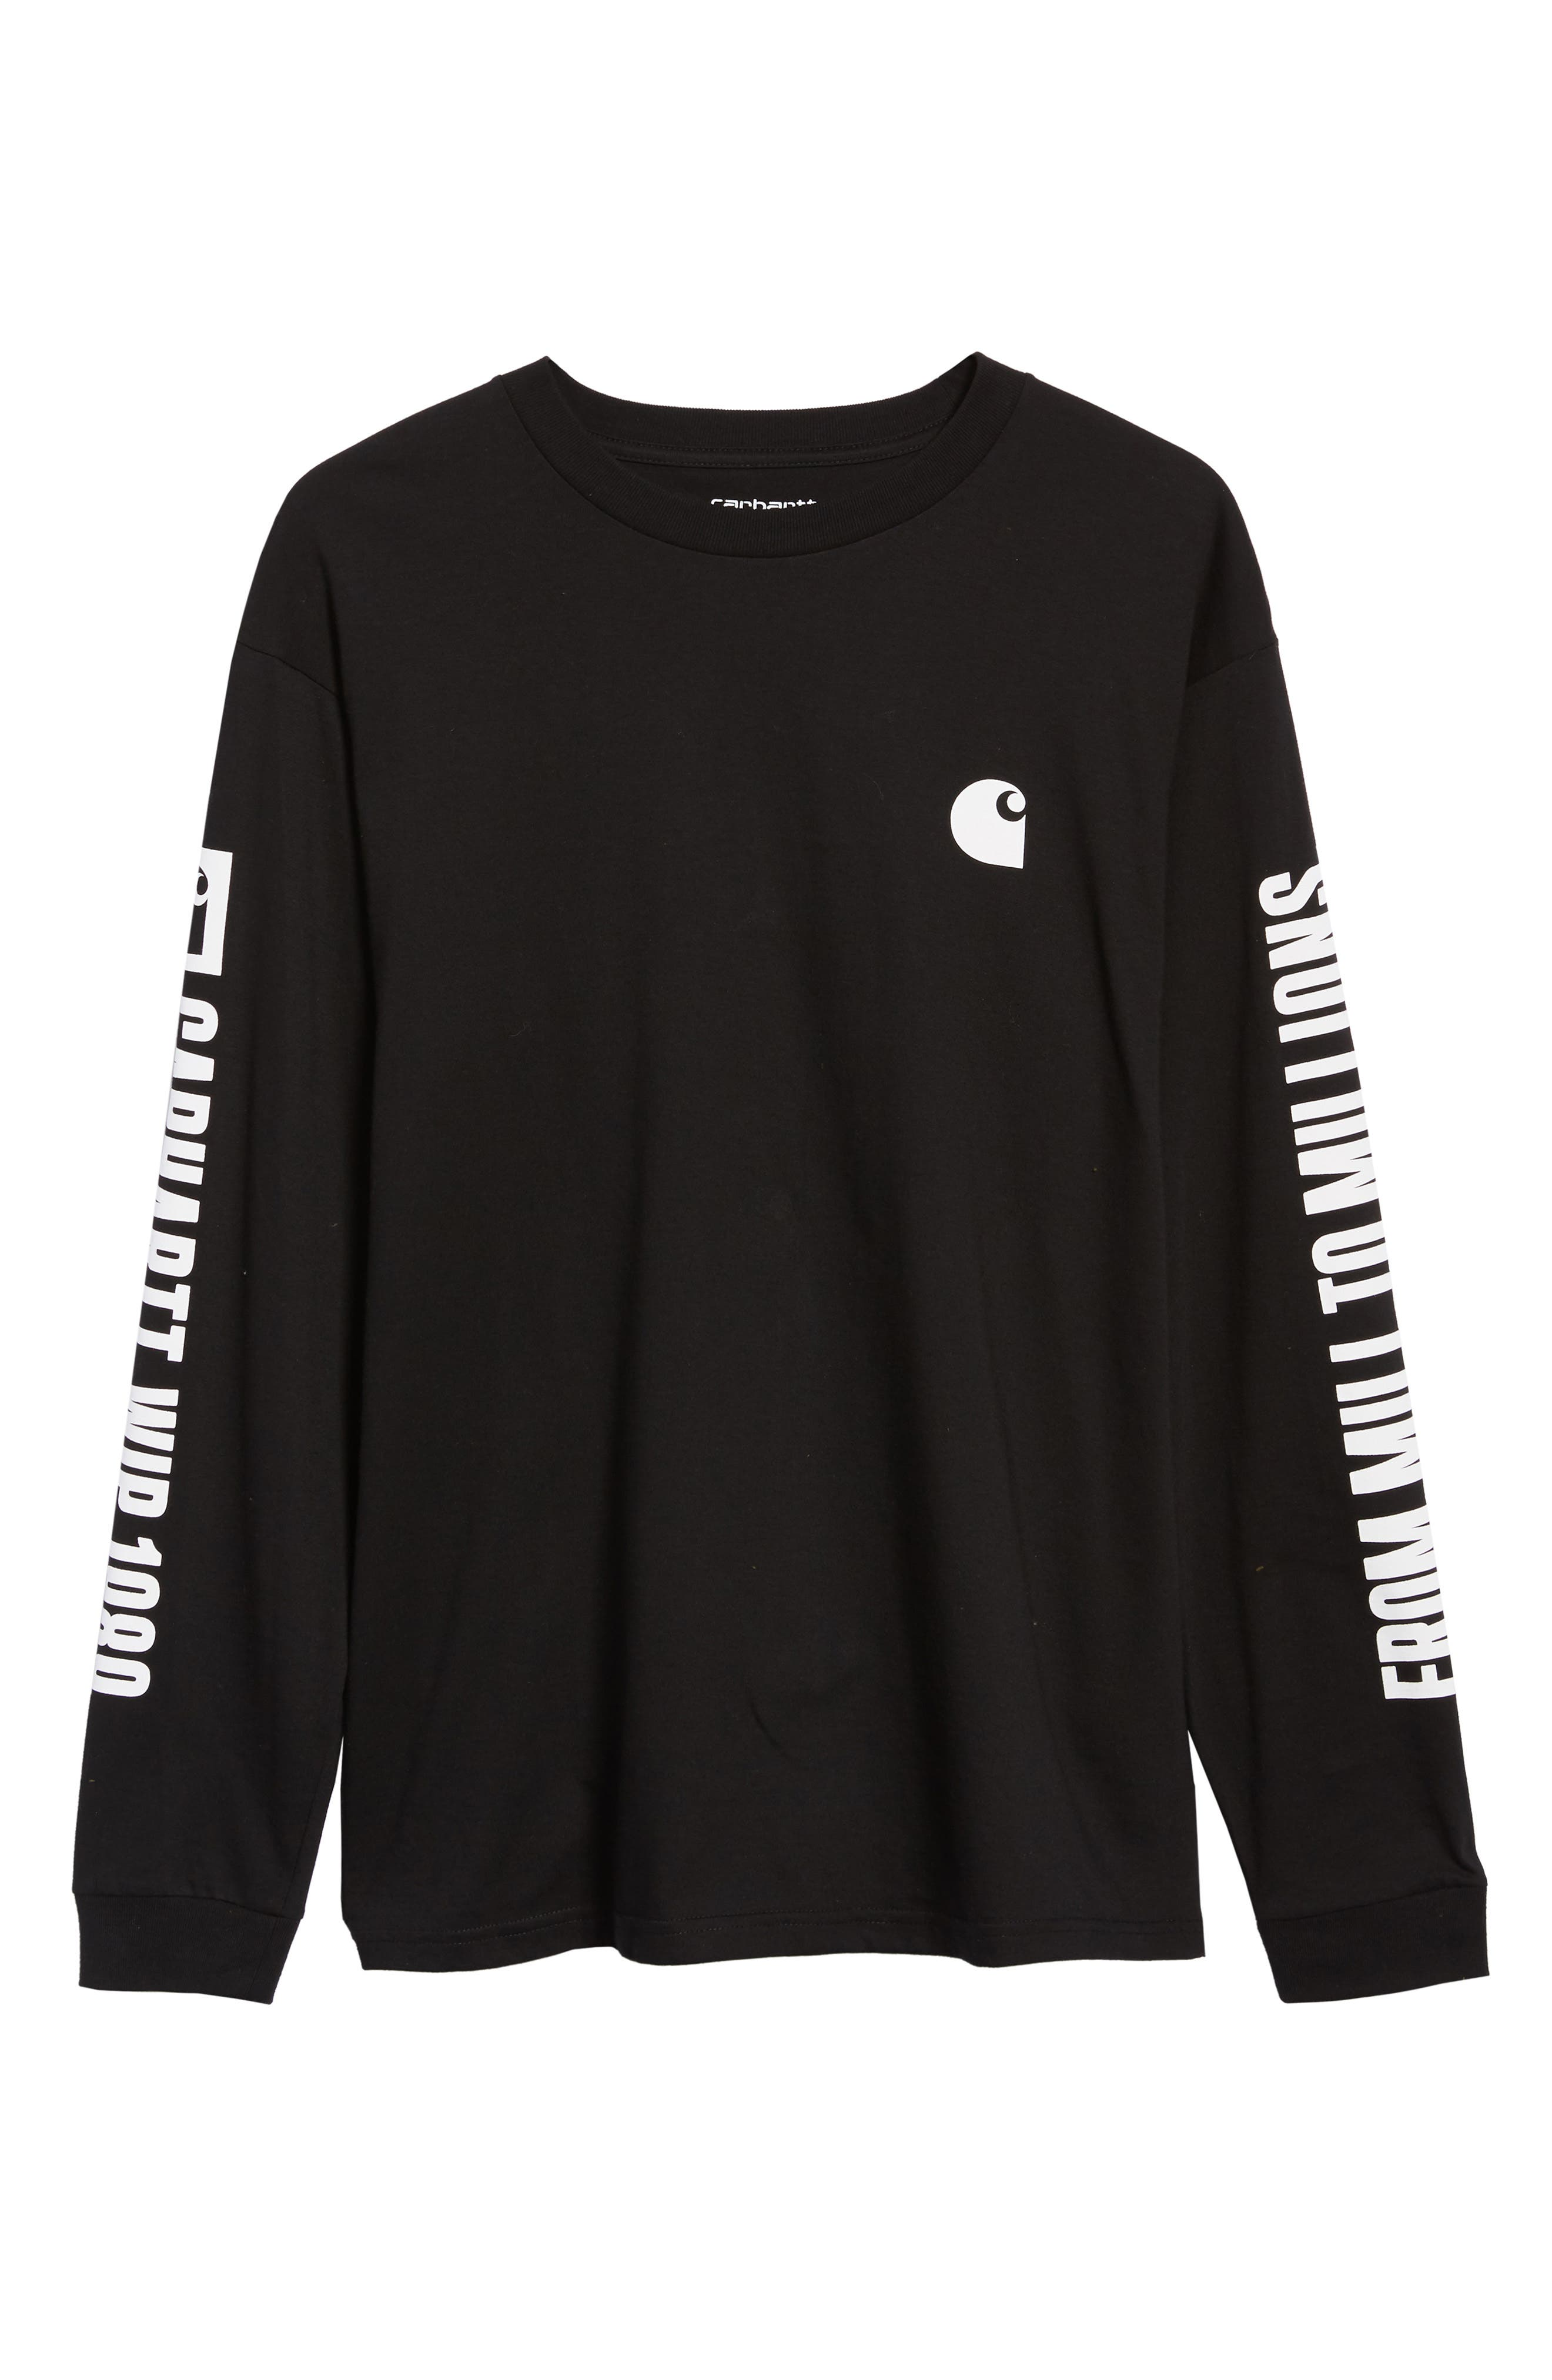 Long Sleeve 1989 T-Shirt,                             Alternate thumbnail 6, color,                             BLACK / WHITE